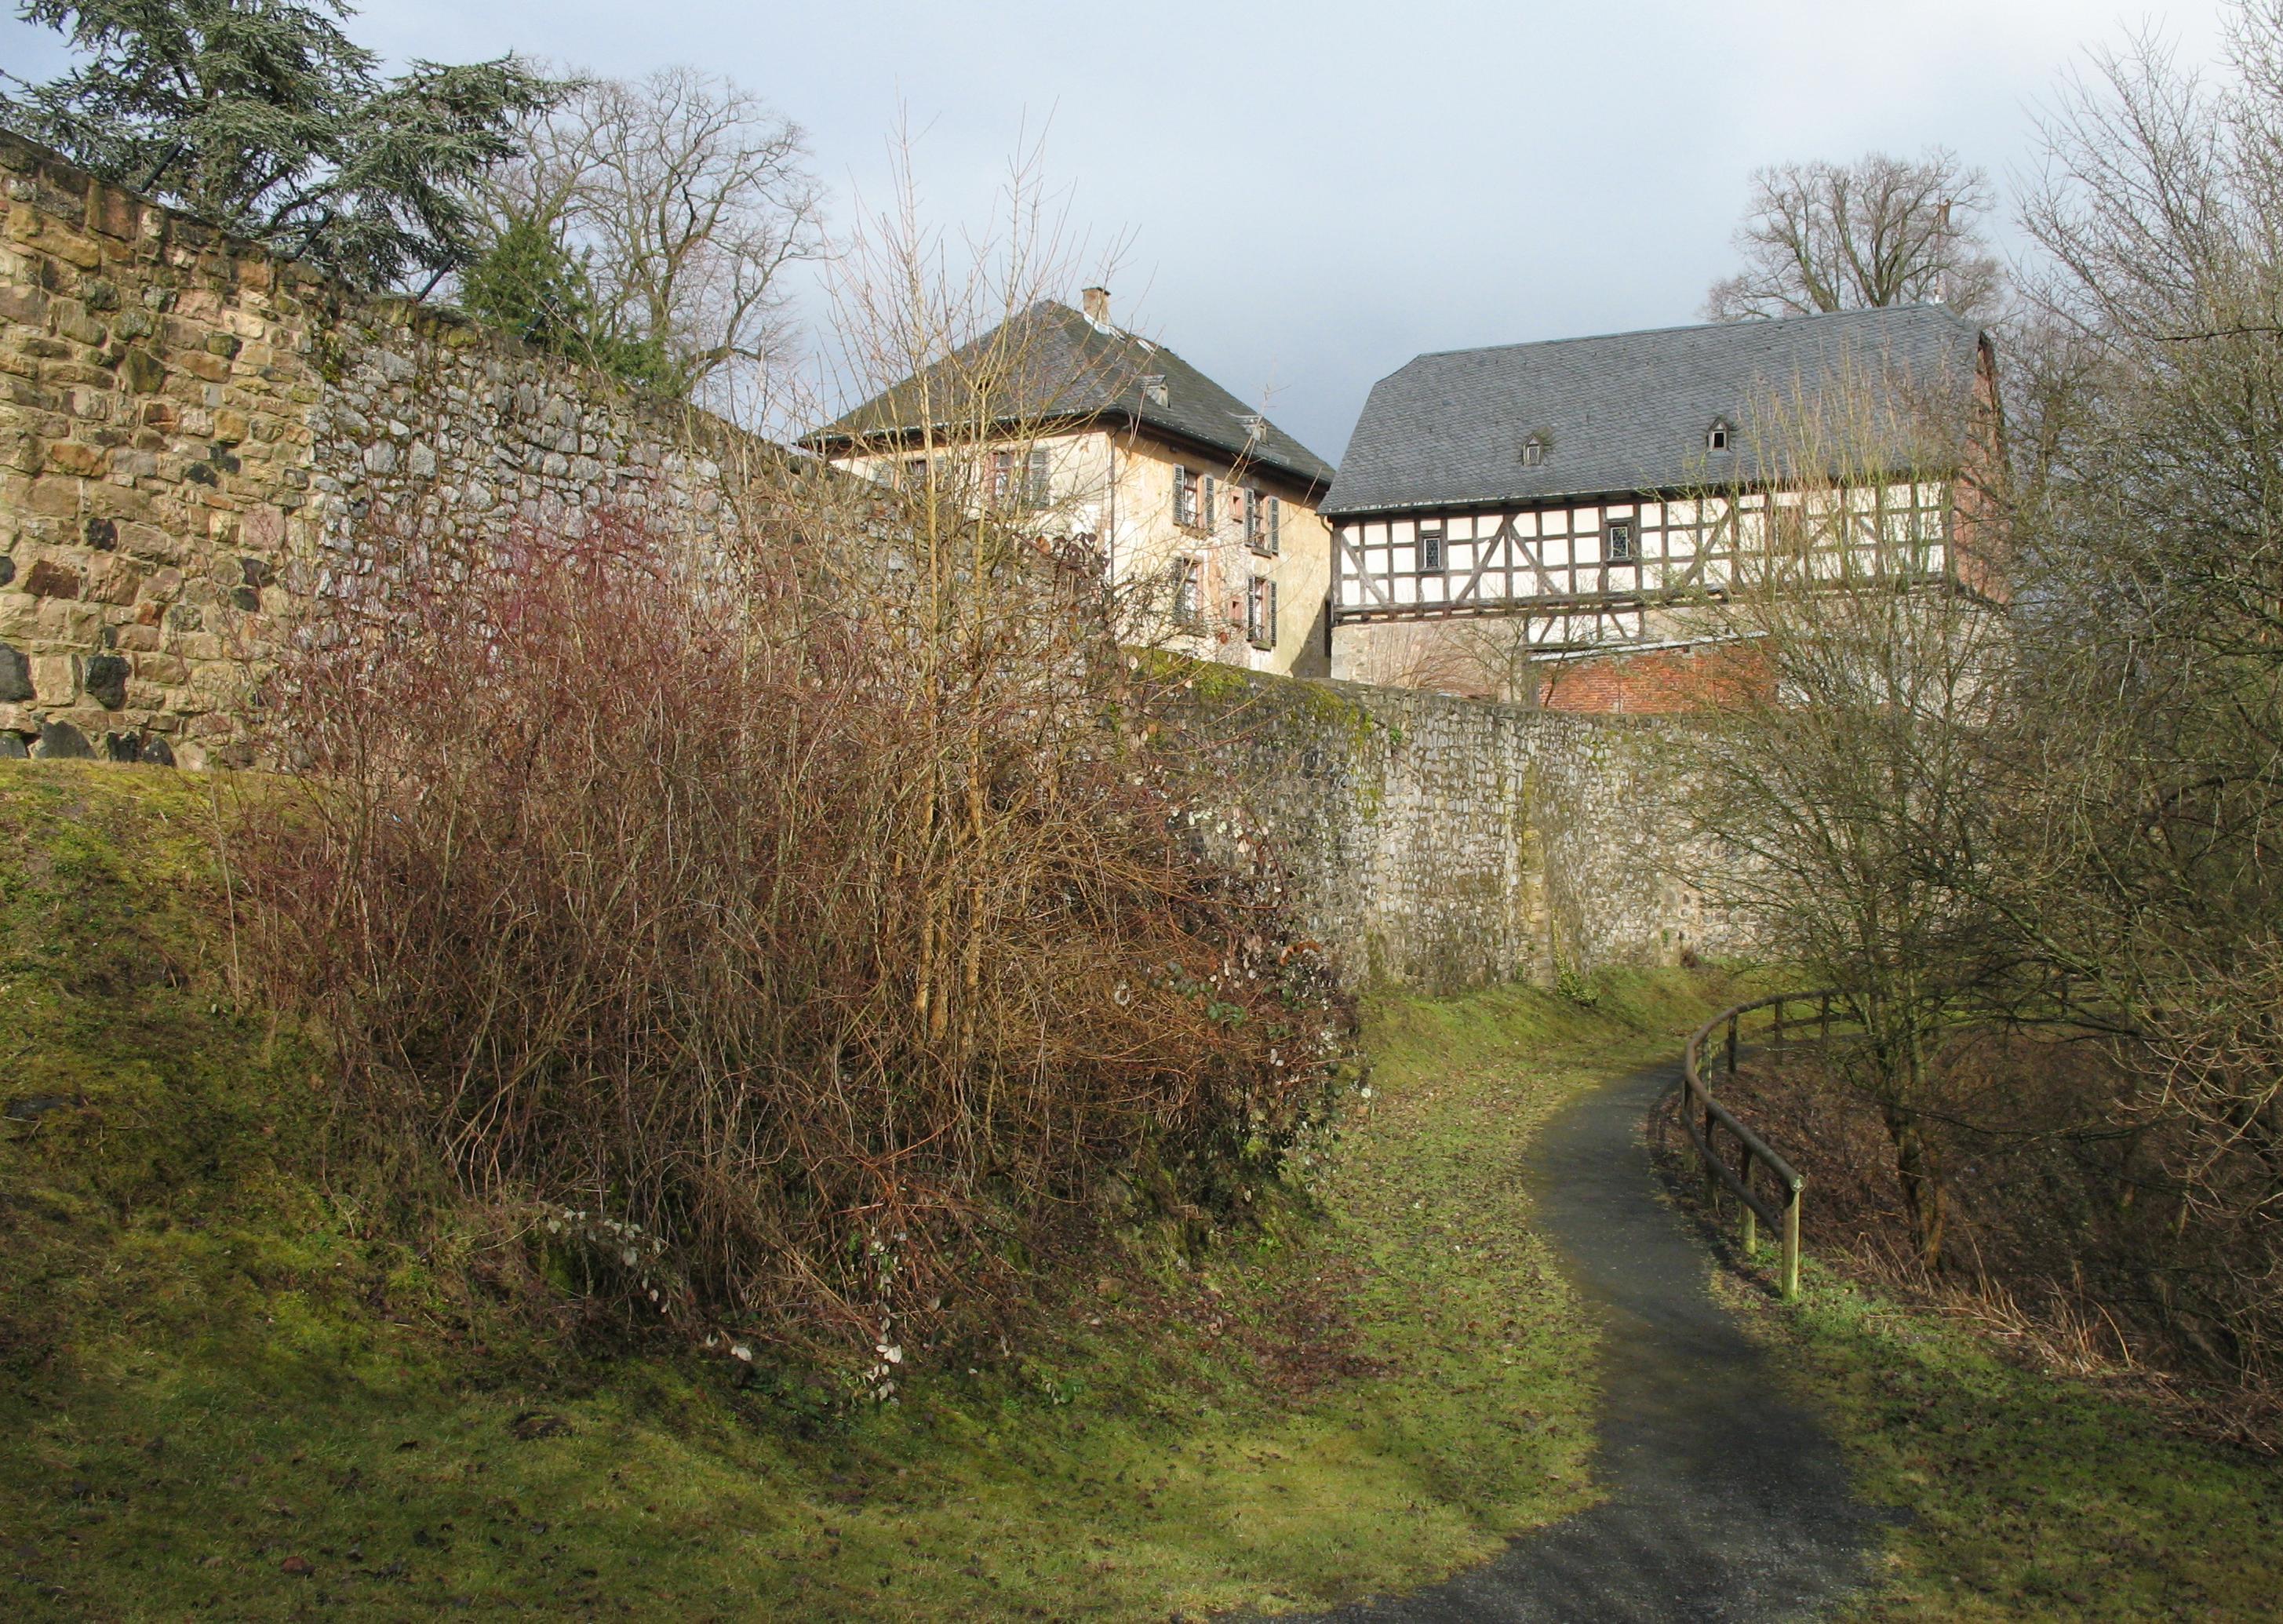 Homberg (Ohm)